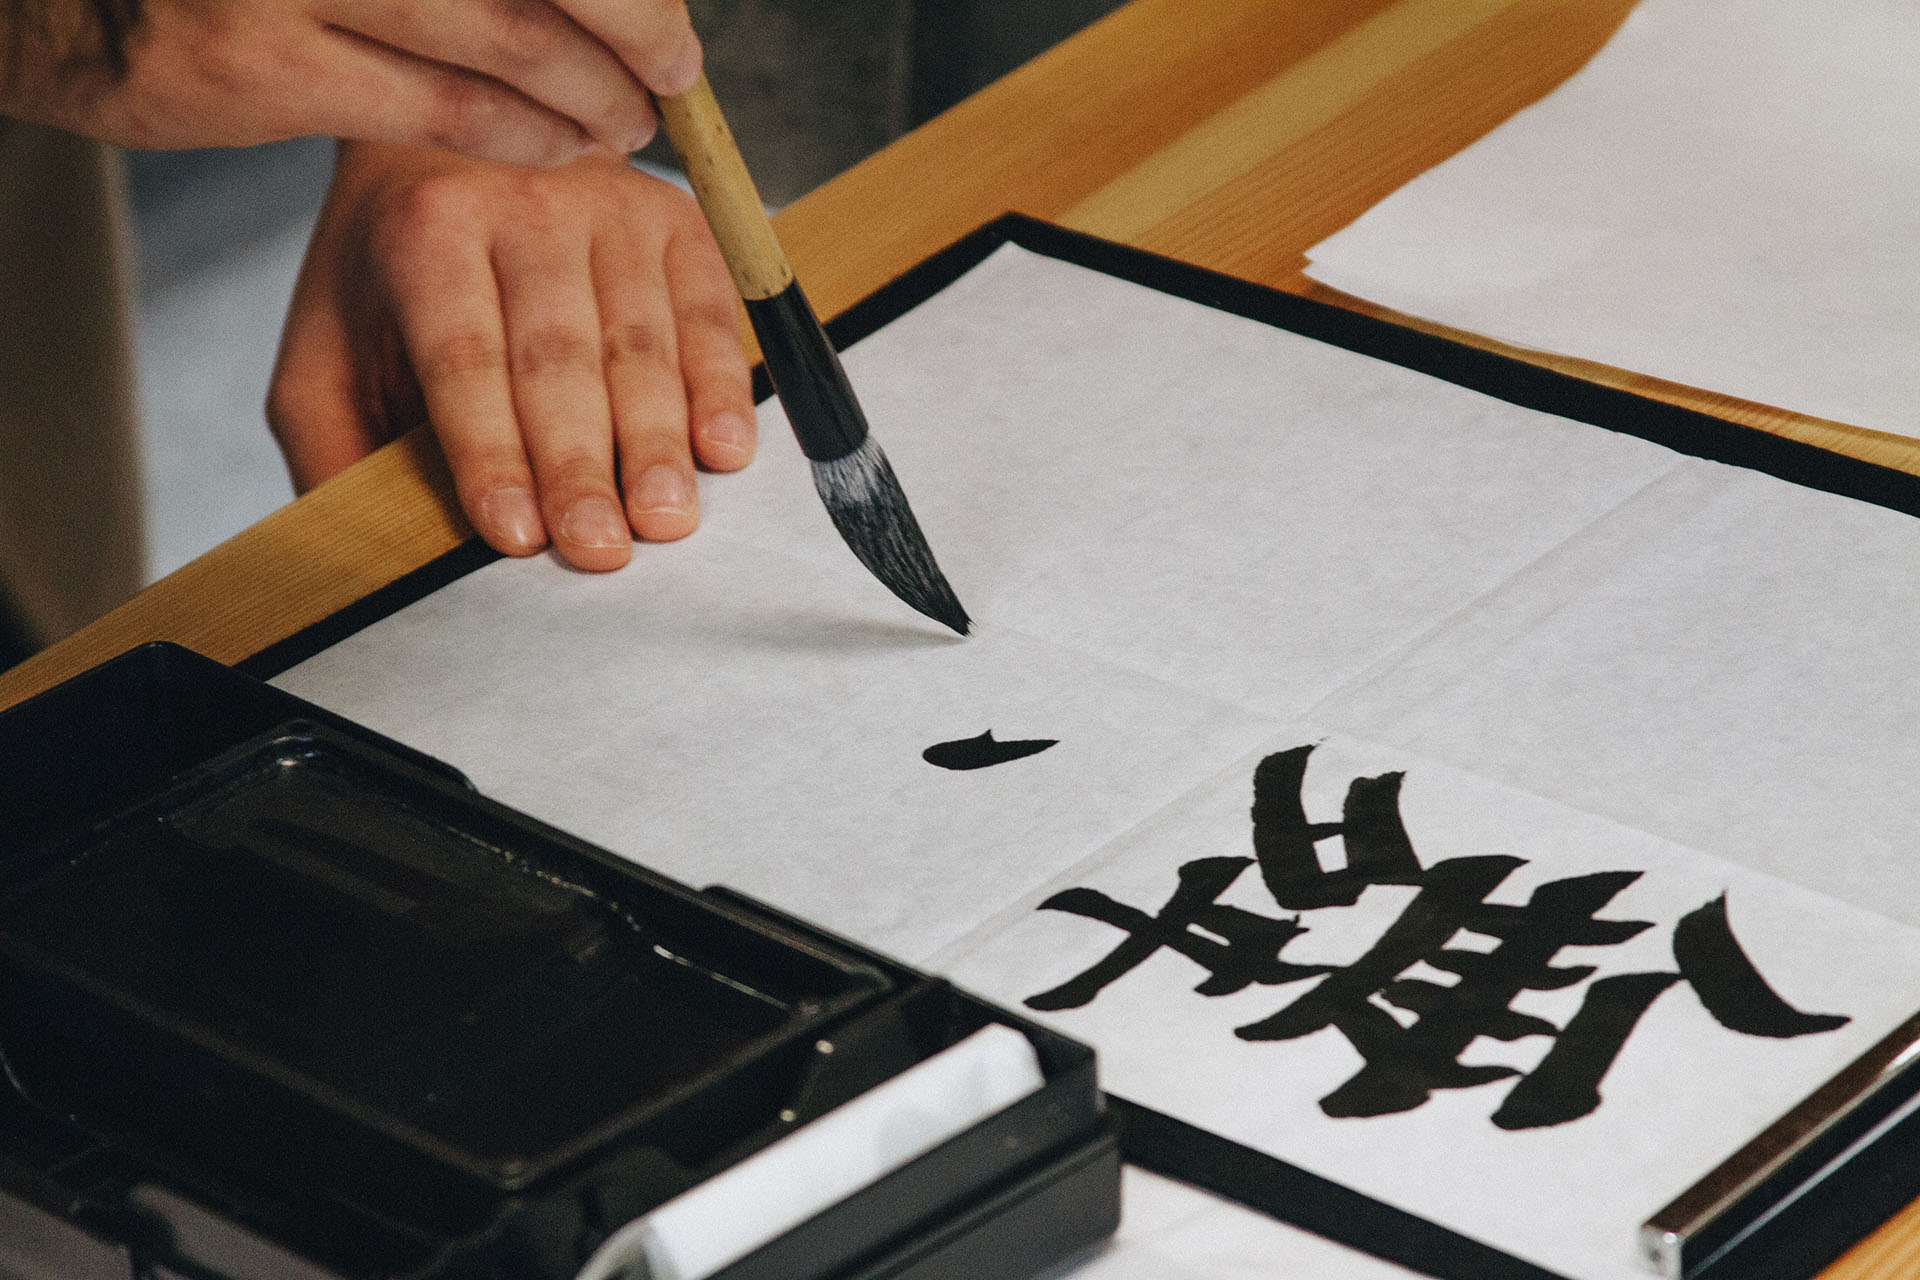 Tinta China para Pintar, Como hacer uso de ella